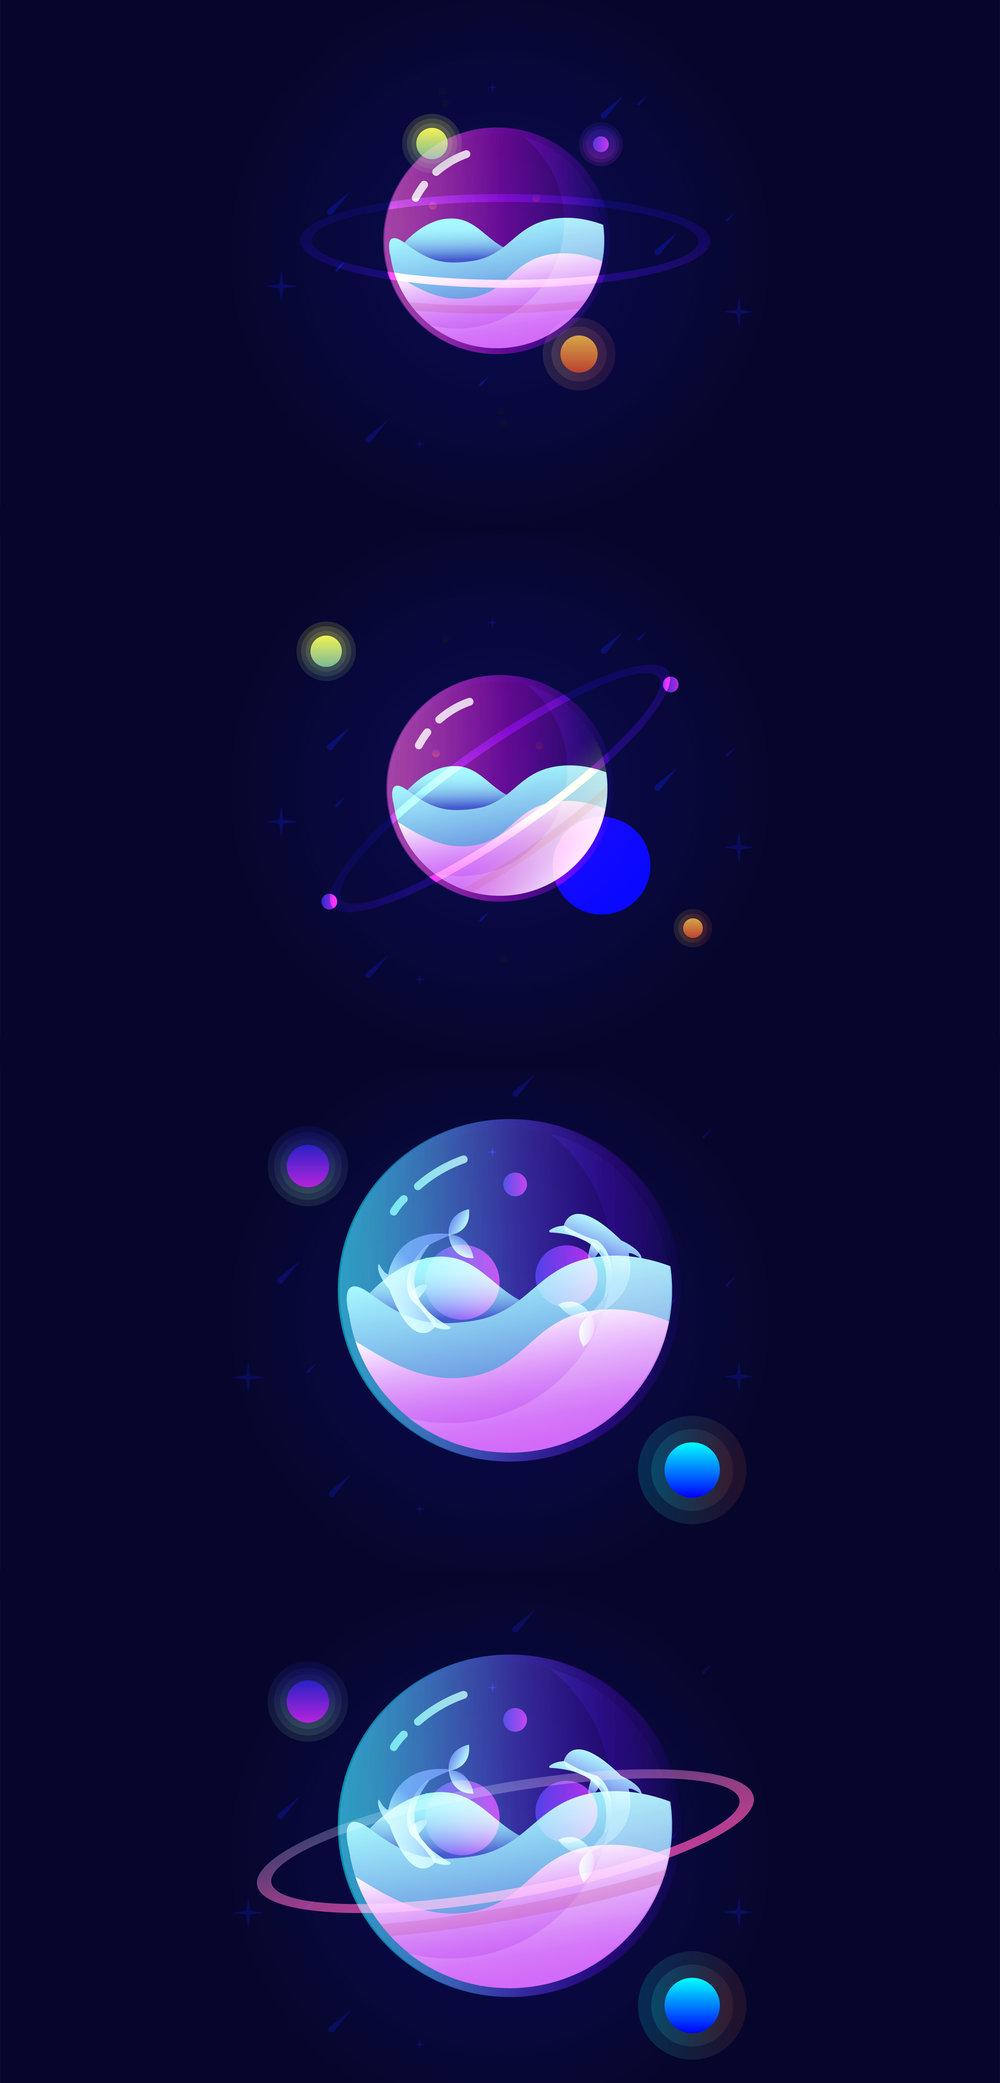 SPACE_ILLUSTRATION.jpg